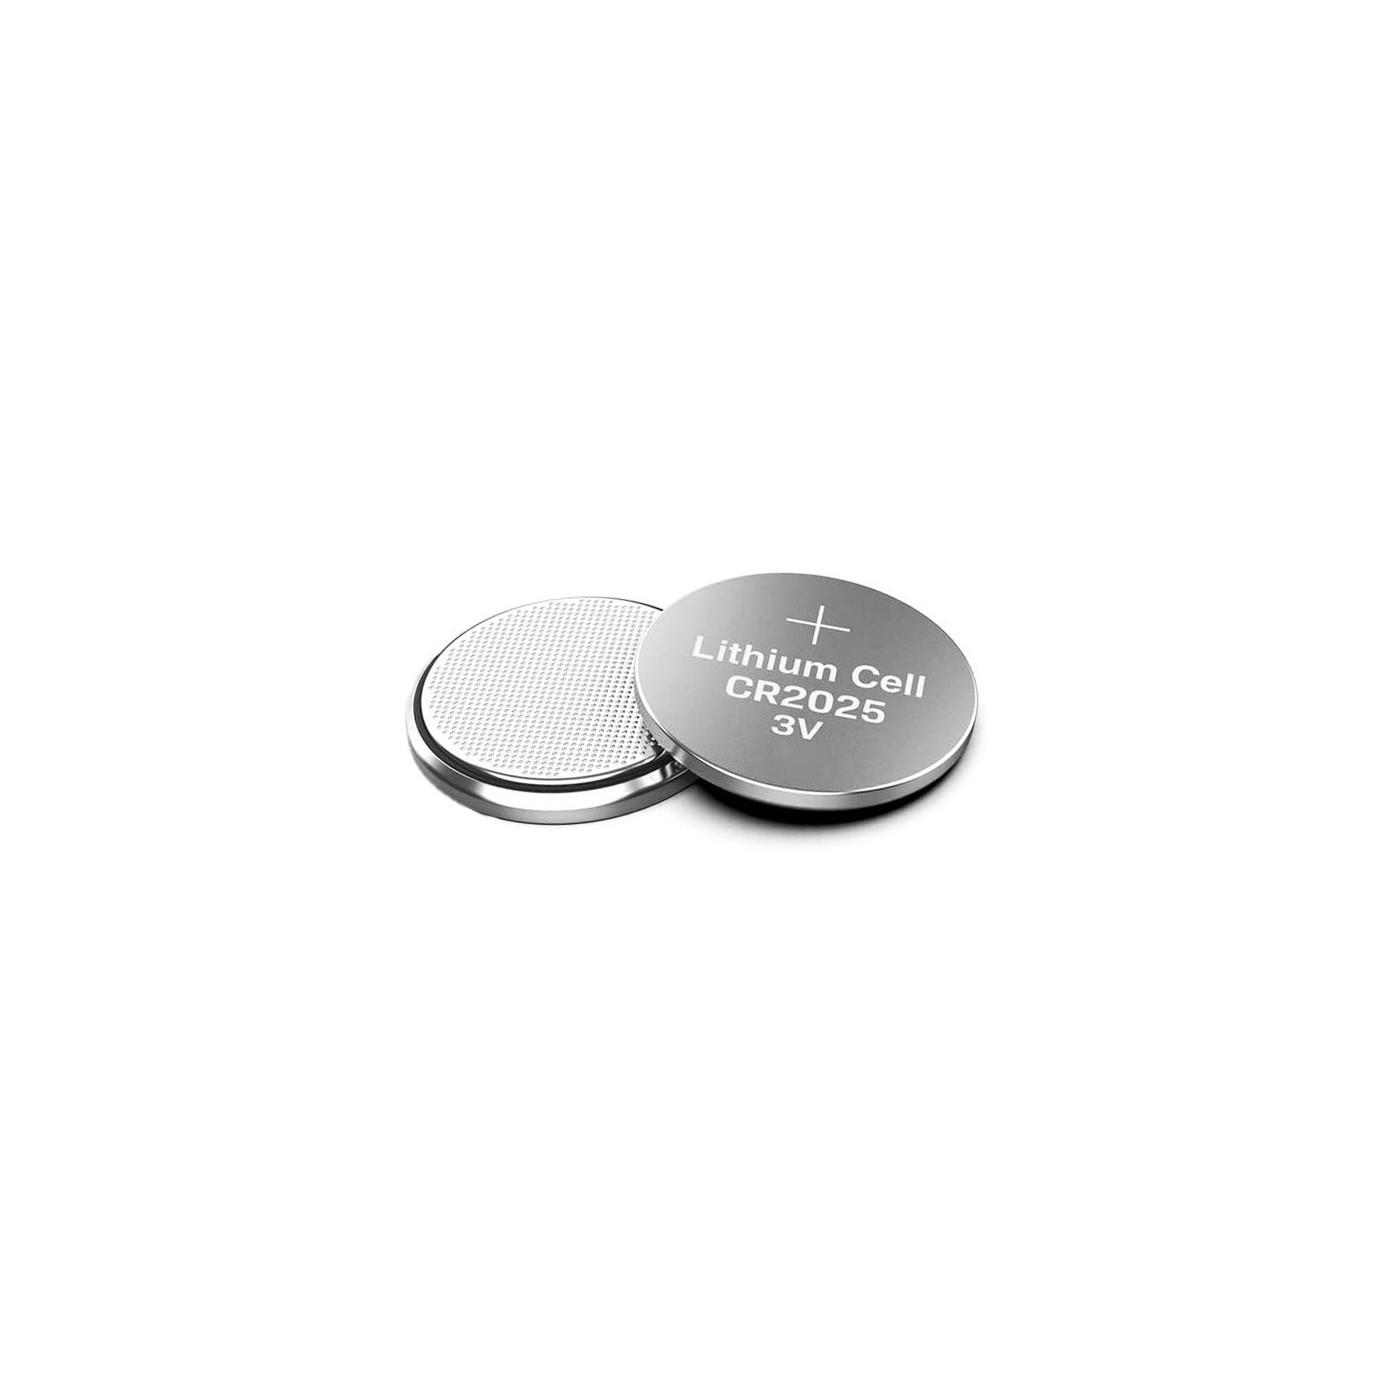 Set of 5 CR2025 batteries (button cells, 3V)